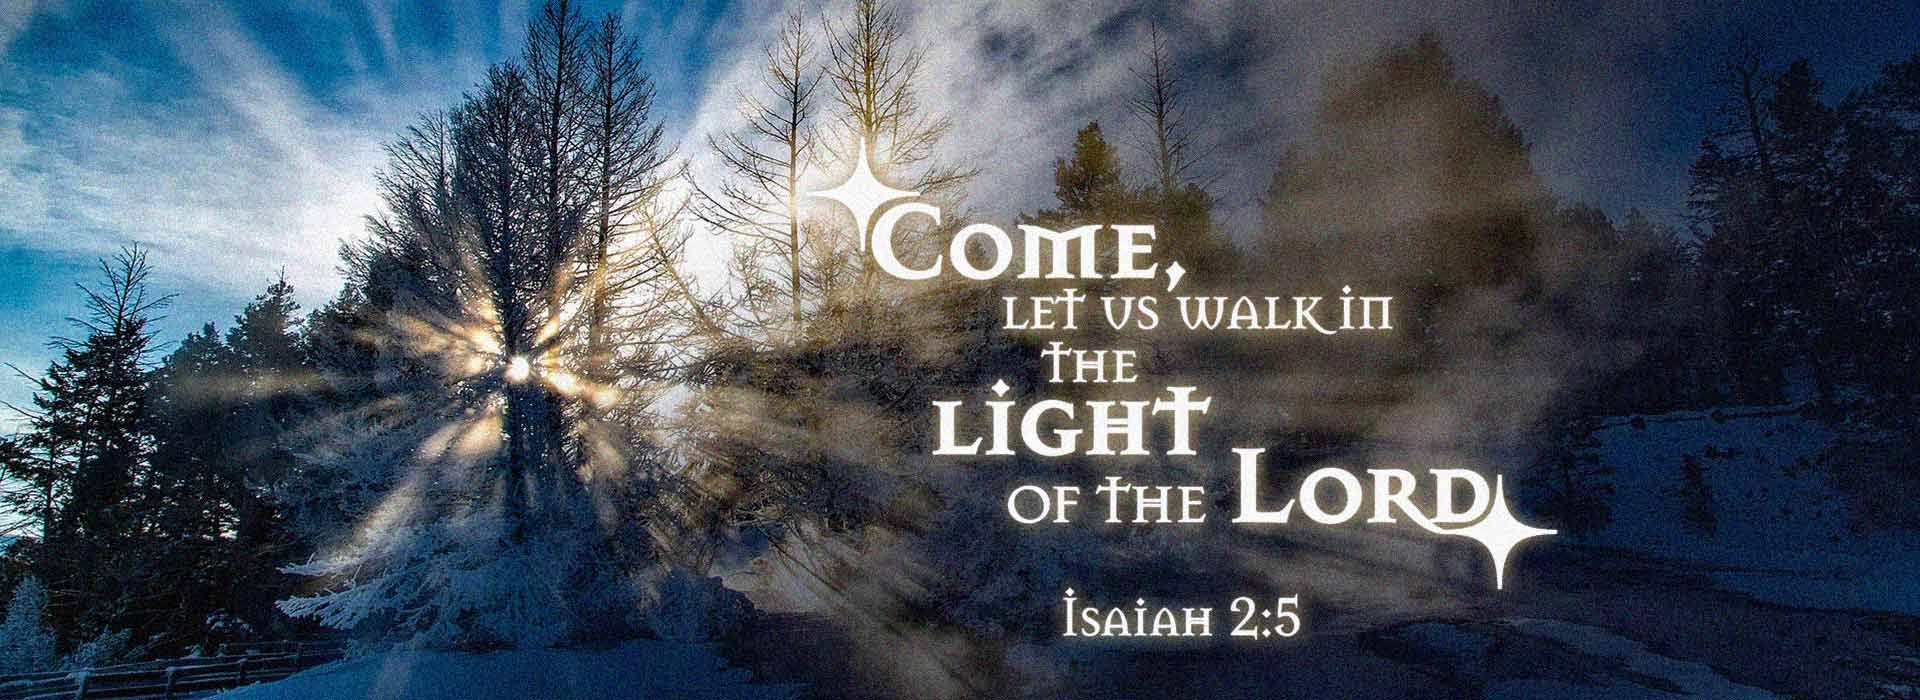 Sunday 29th November 1st Sunday of Advent